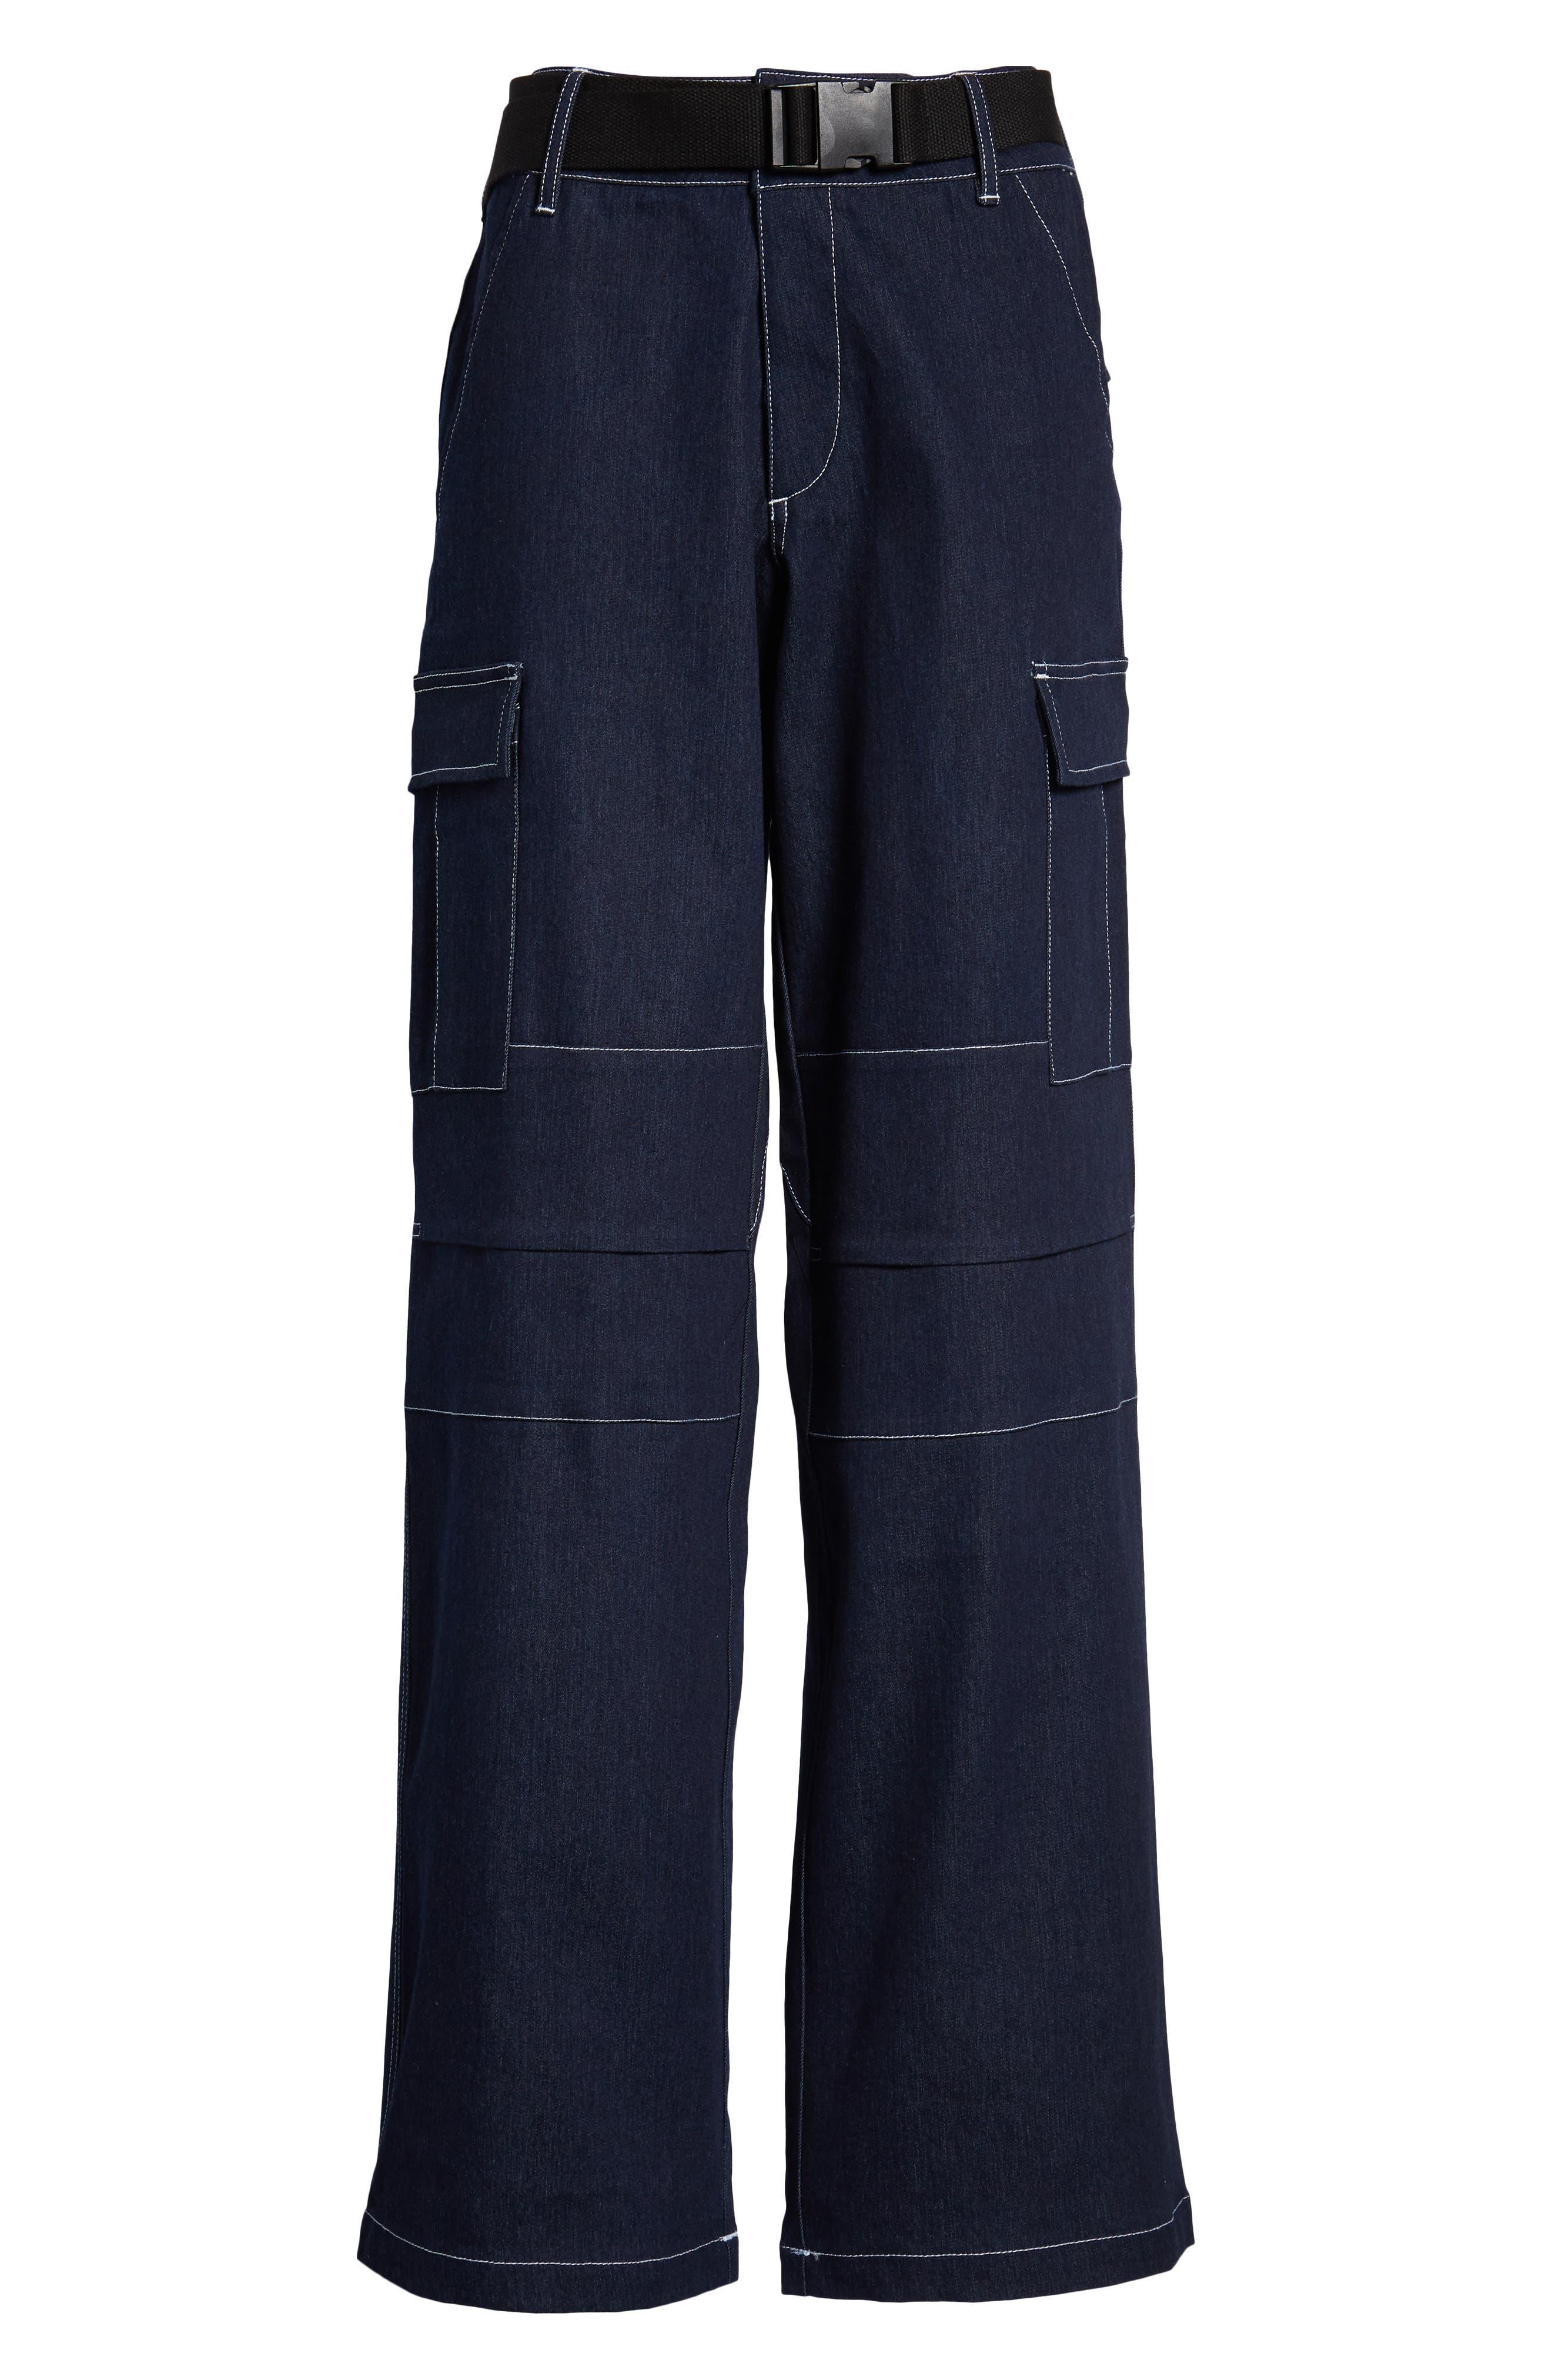 I.AM.GIA Ace Cargo Jeans,                             Alternate thumbnail 6, color,                             DENIM